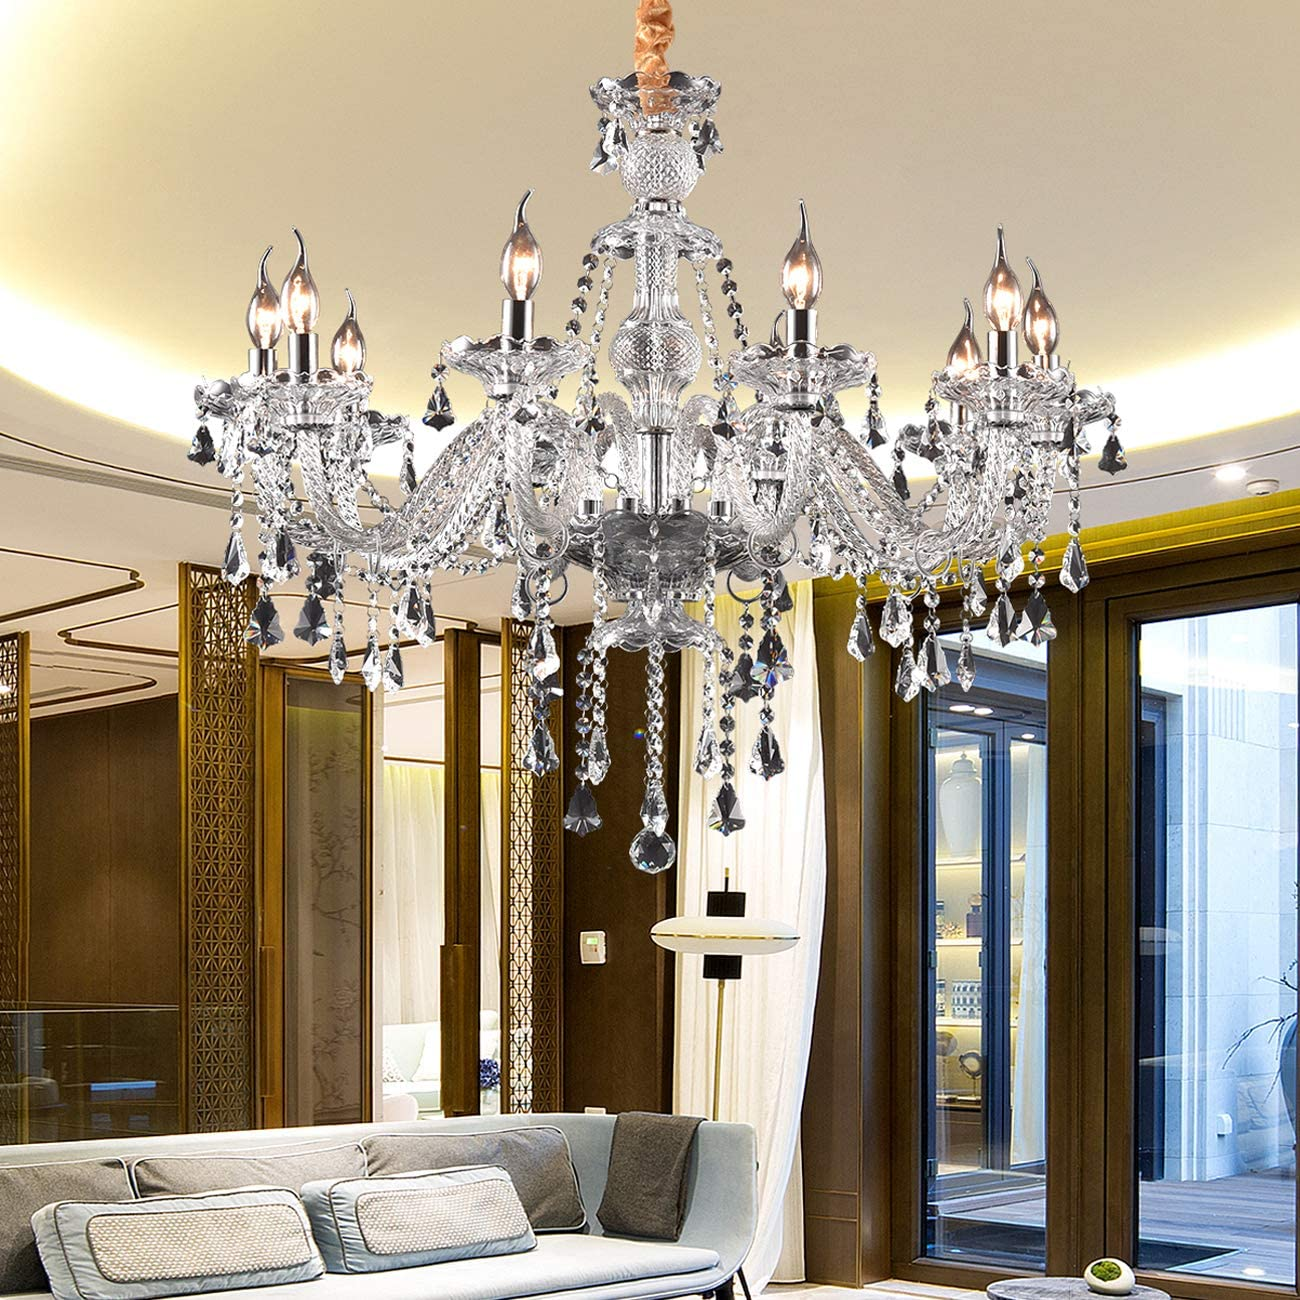 Ridgeyard Modern Luxurious K9 Crystal Chandelier Candle Cognac Pendant Lamp Ceiling Living Room Lighting for Dining Living Room Bedroom Hallway Entry